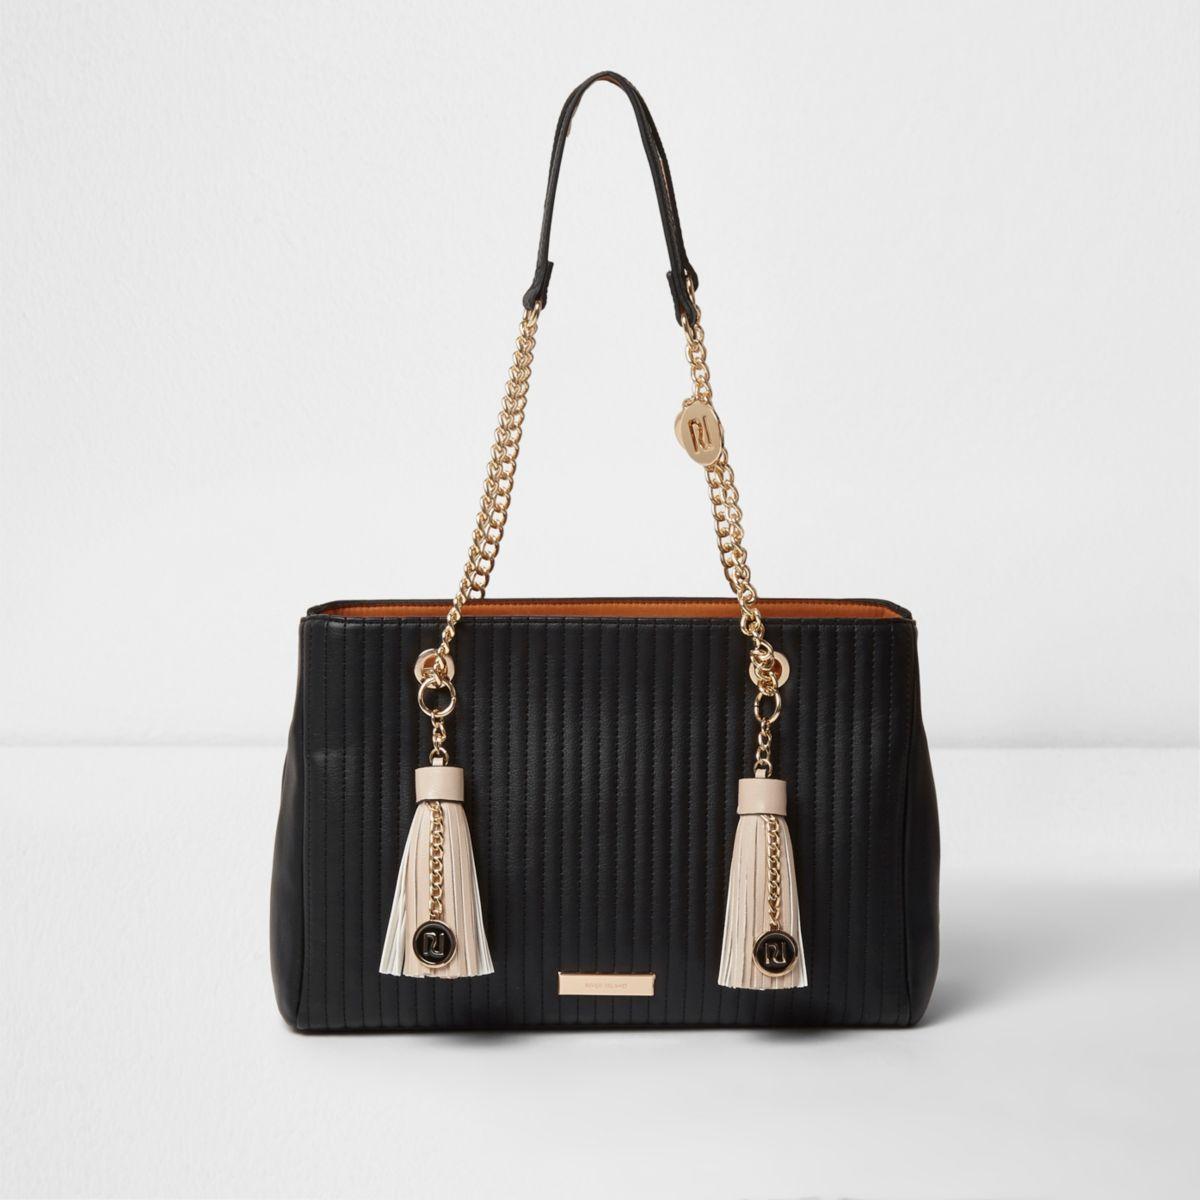 Black double tassel chain tote bag